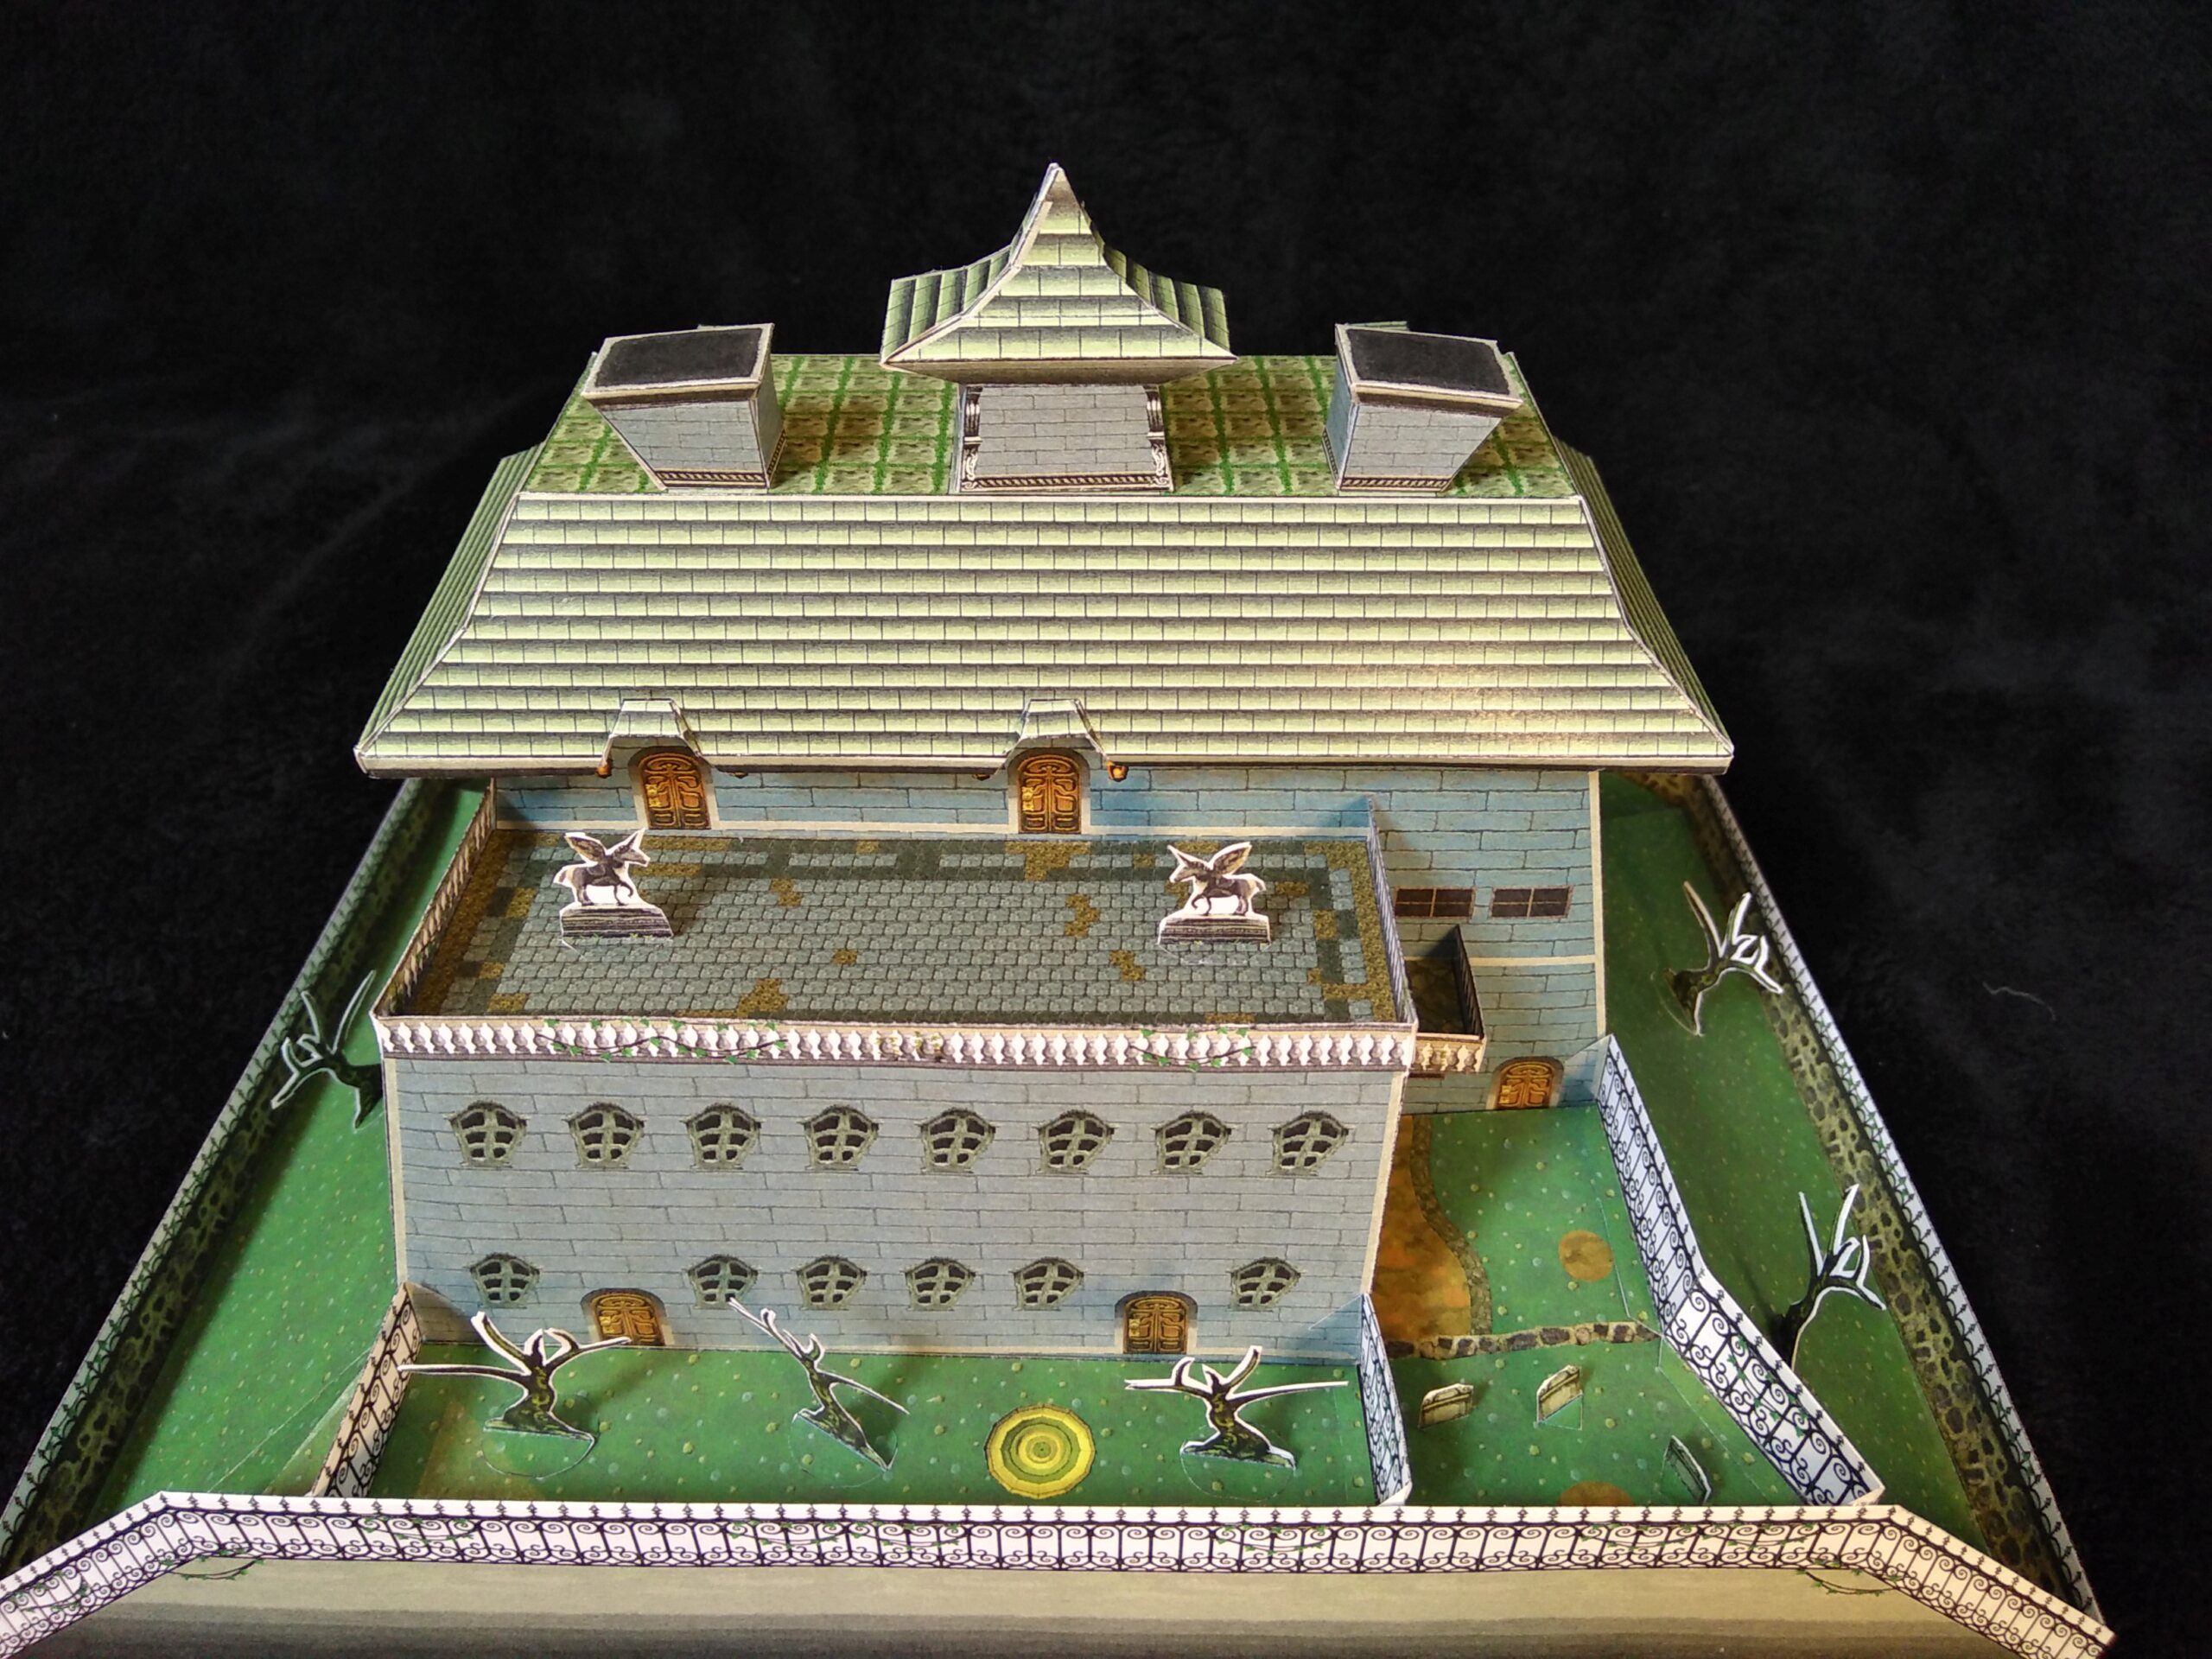 Luigi's Mansion - Die Gruselvilla aus dem Gamecube-Klassiker Img_2020